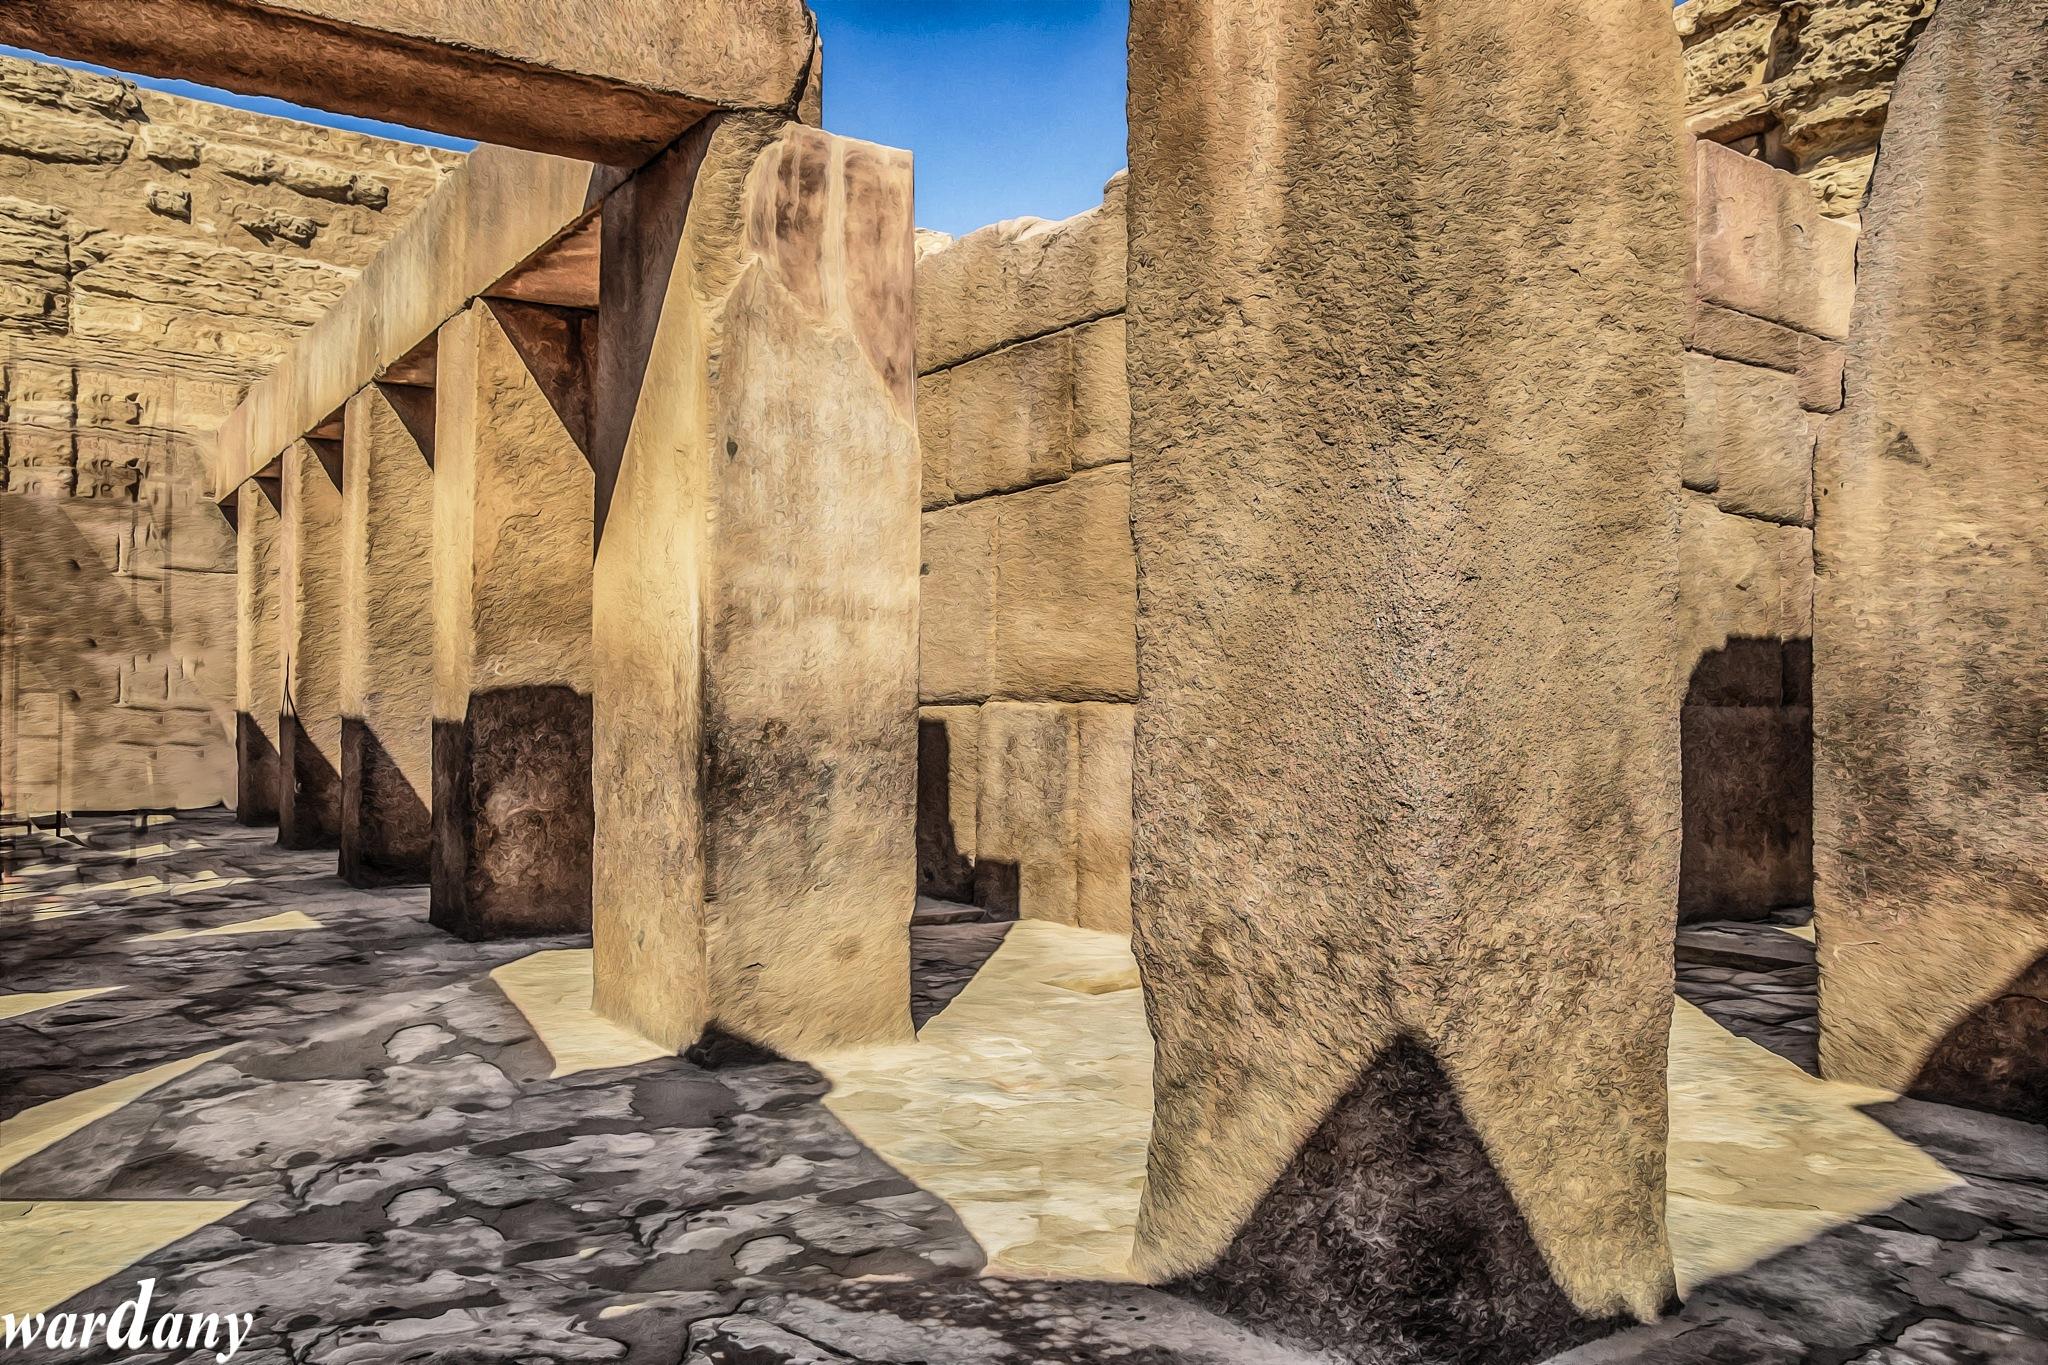 egypt 2 by wardanyboody